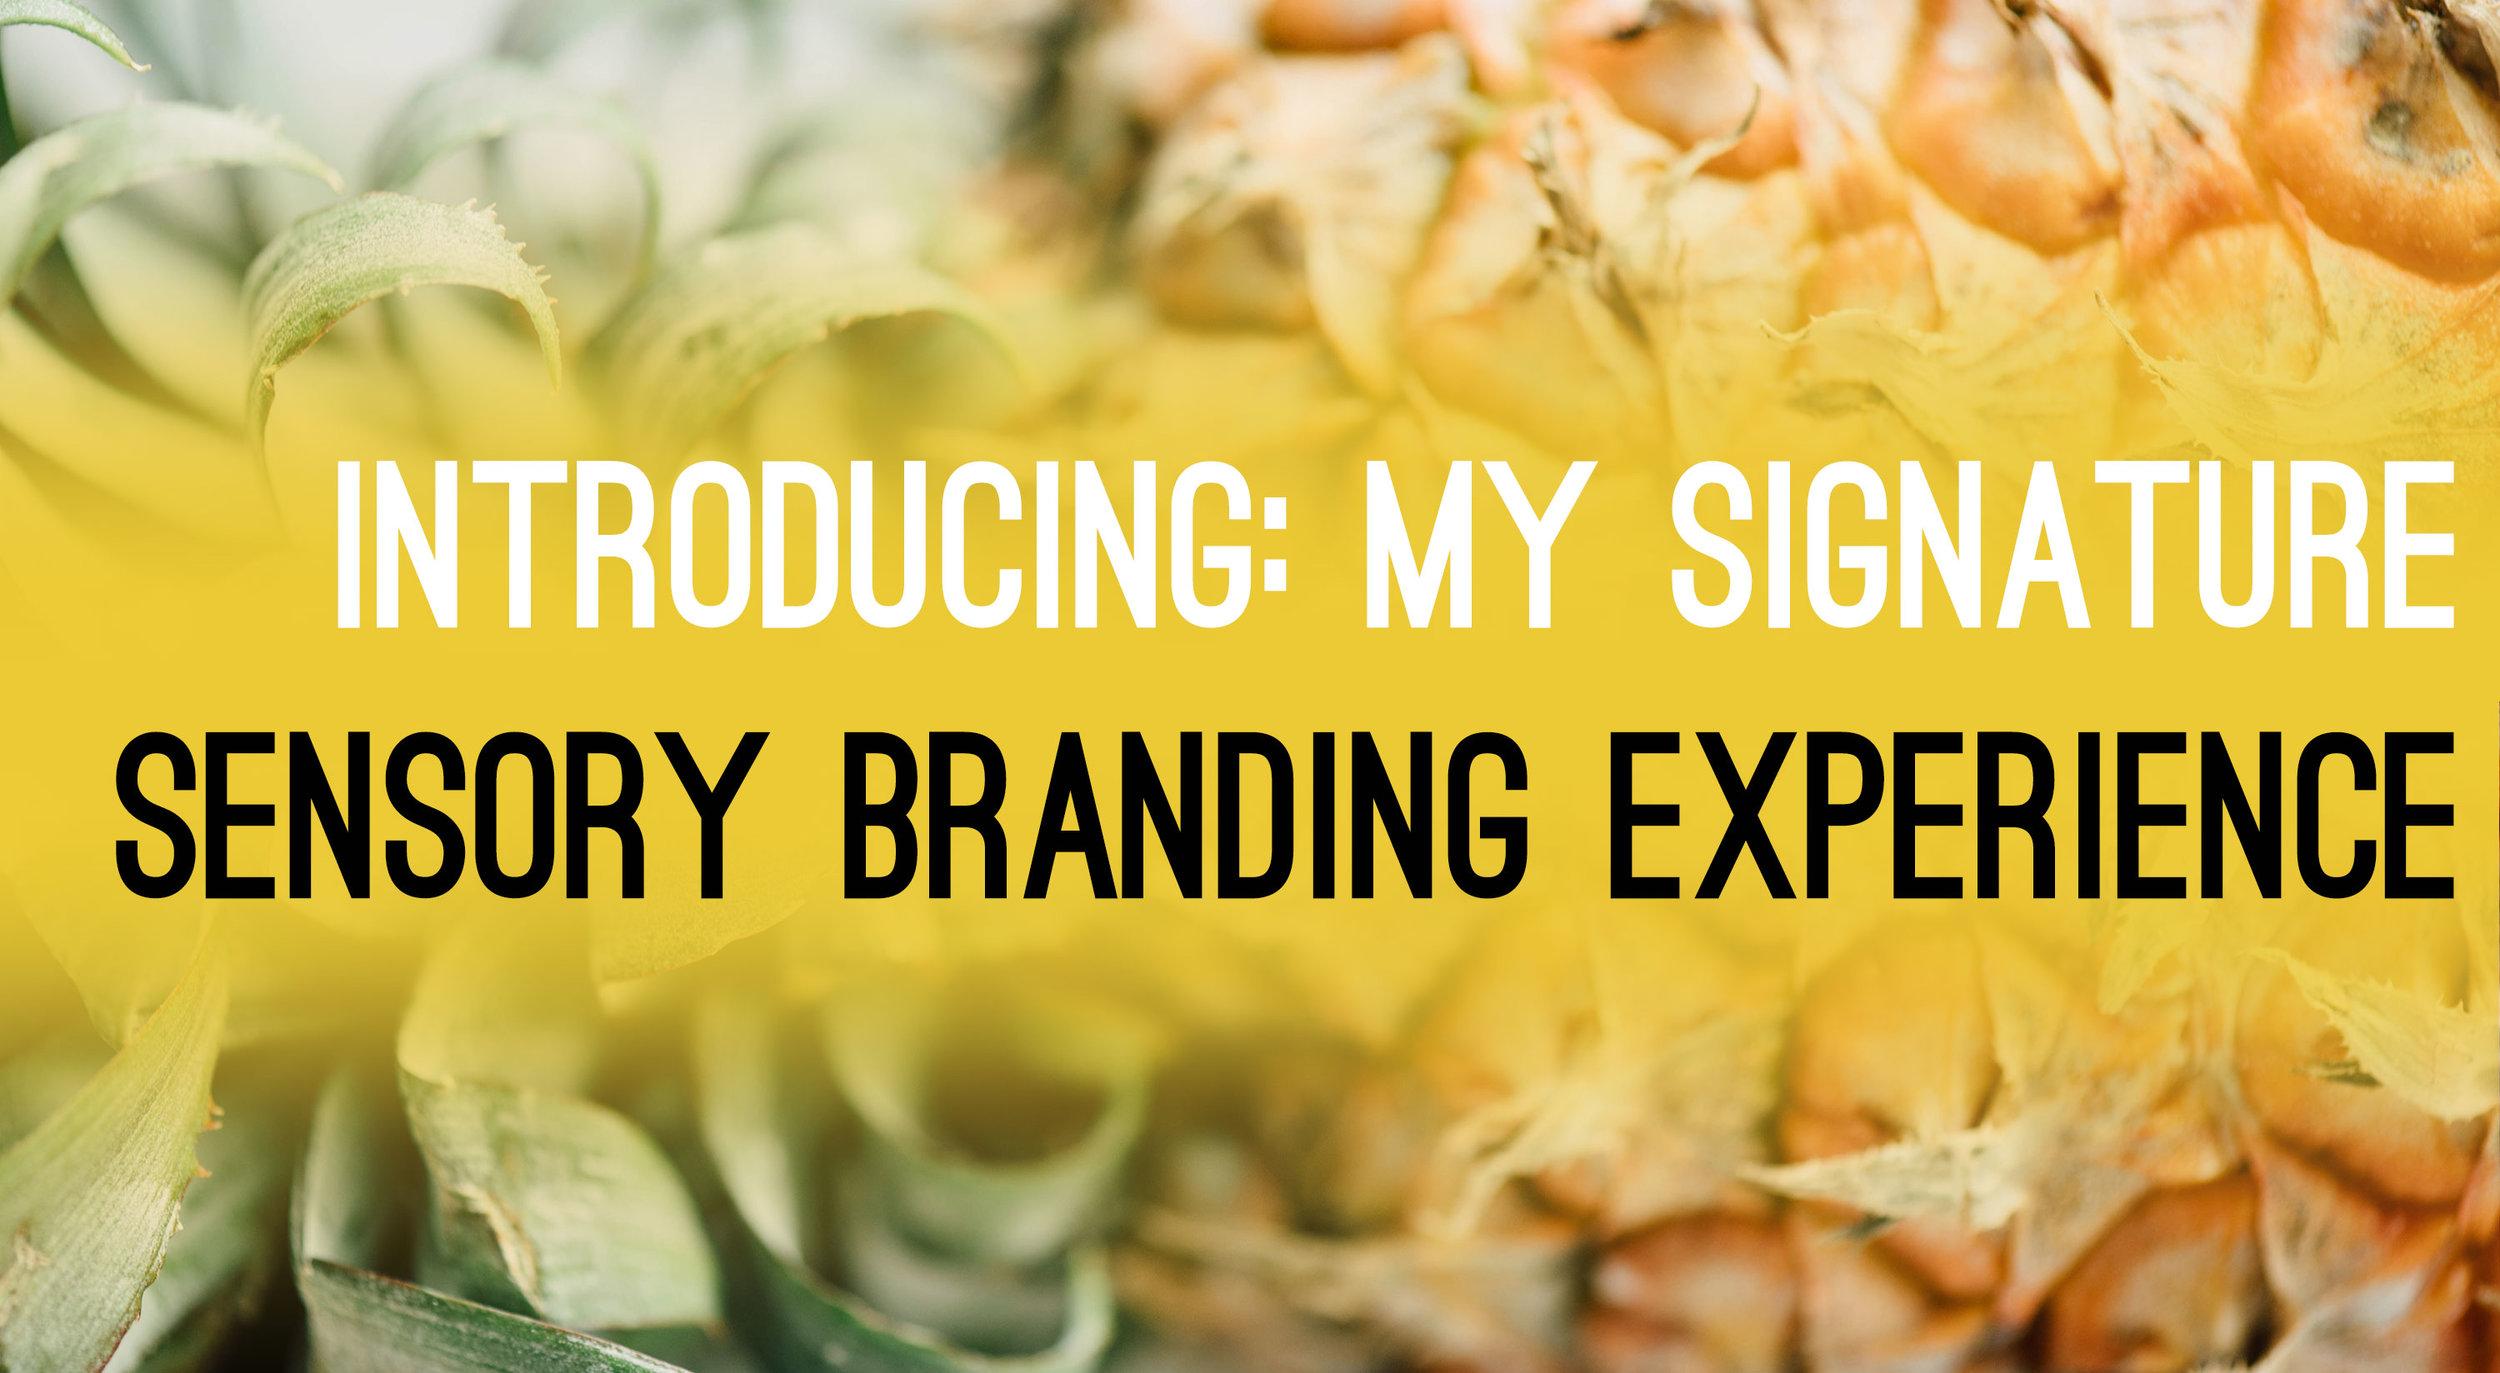 jc-signature-sensory-branding-experience-graphic.jpg